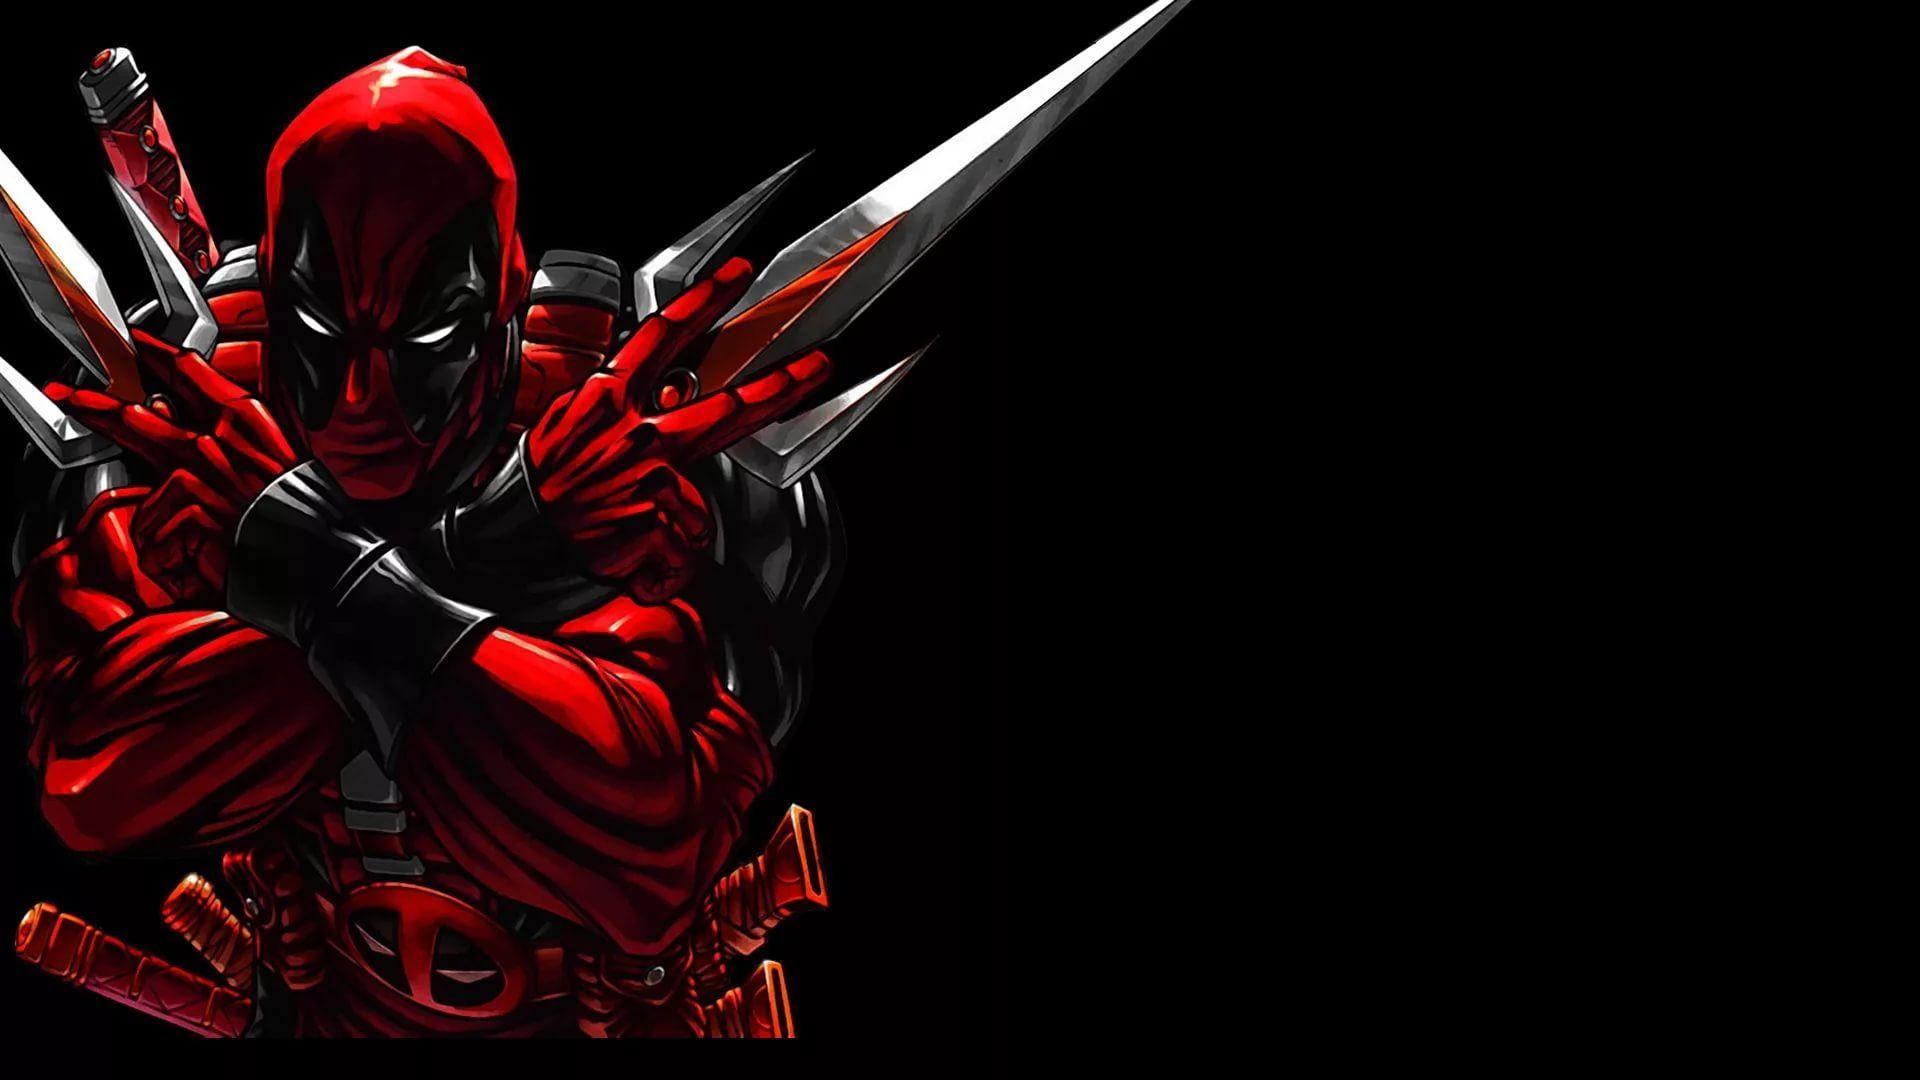 Cool Deadpool free hd wallpaper